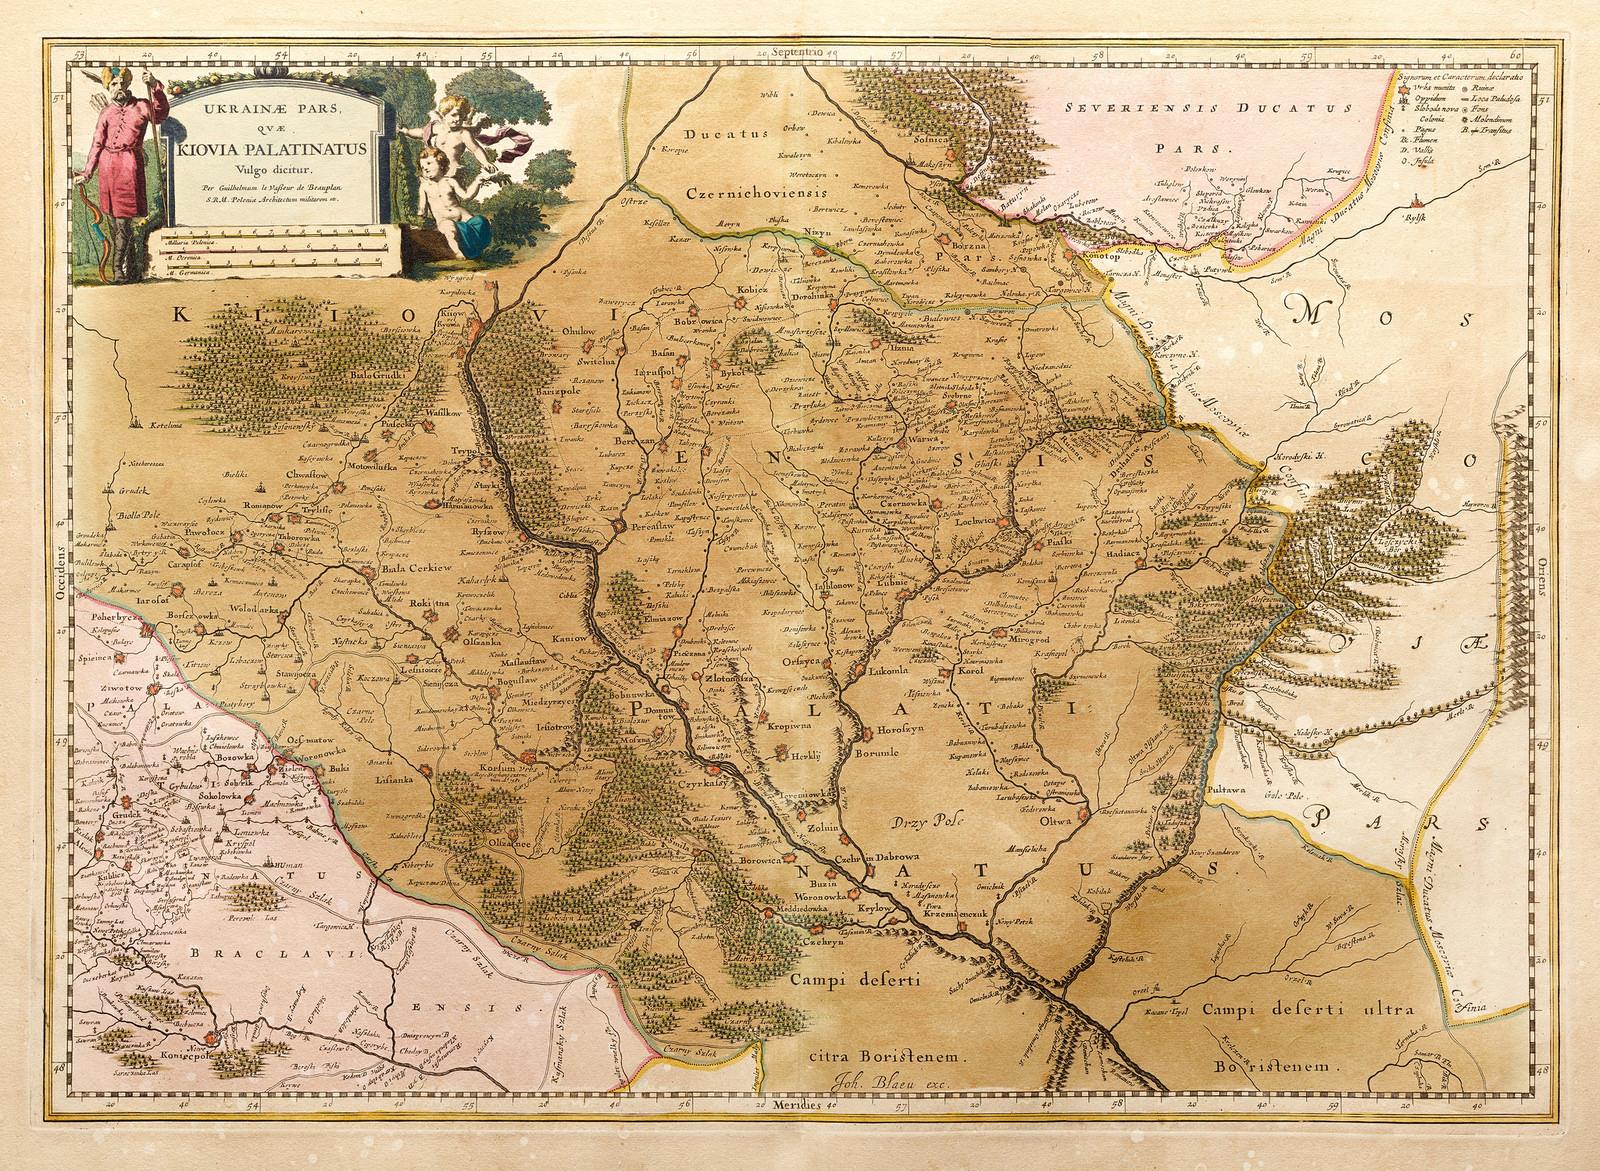 Ukrainae pars qvae Kiovia Palatinatus 1670